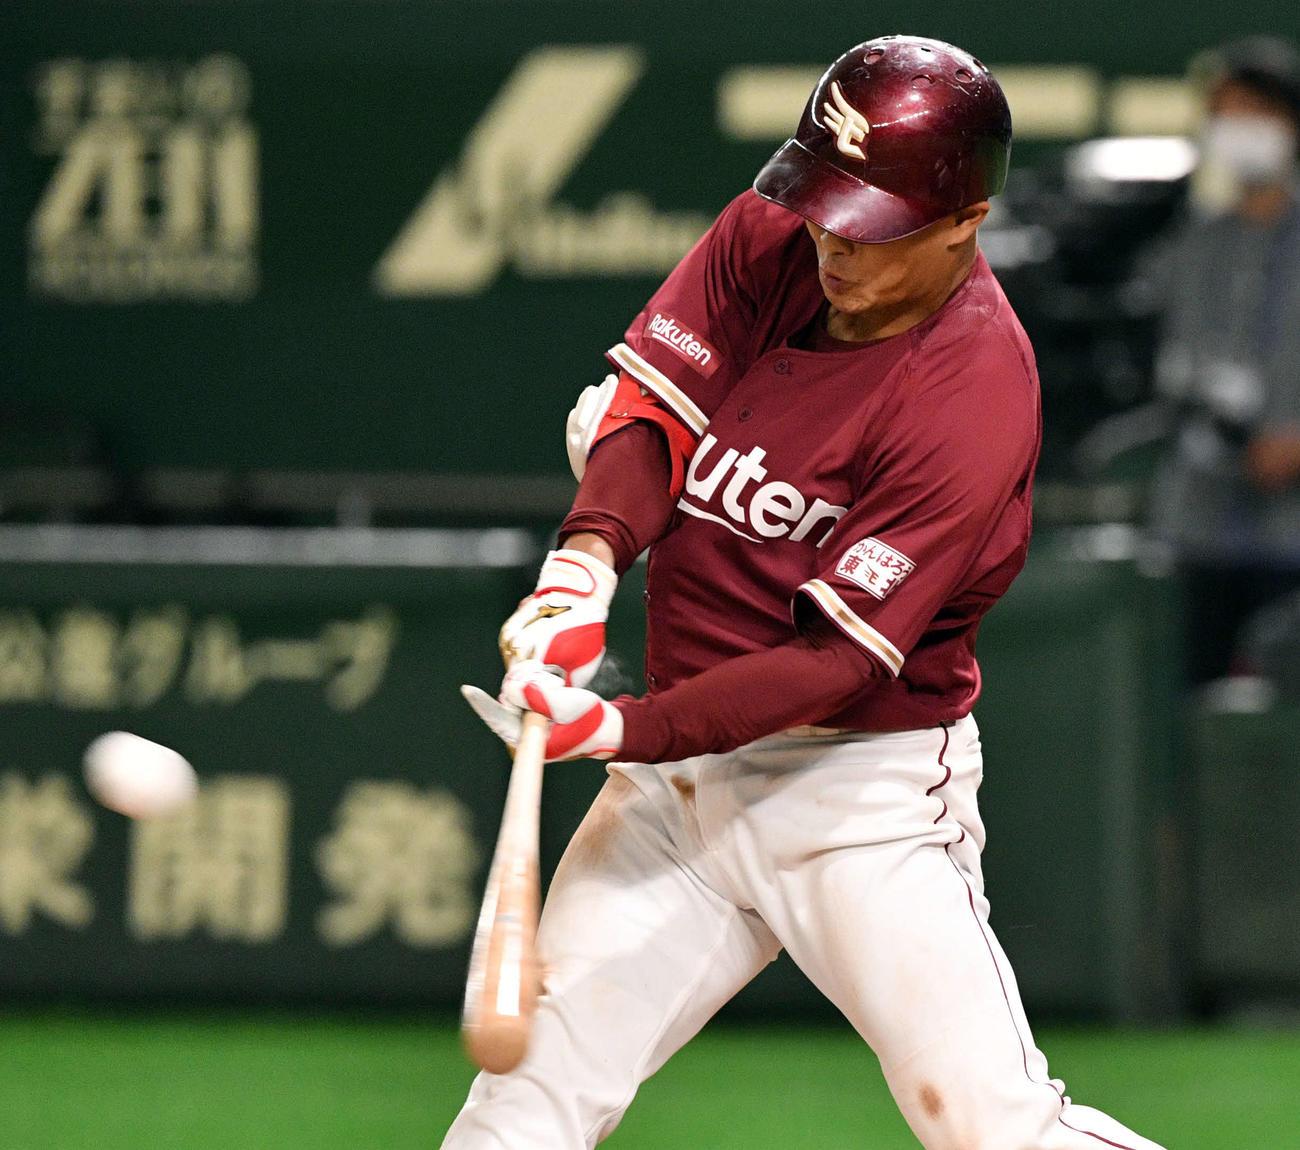 巨人対楽天 5回表楽天1死満塁、山崎幹は左越え2点適時二塁打を放つ(撮影・滝沢徹郎)